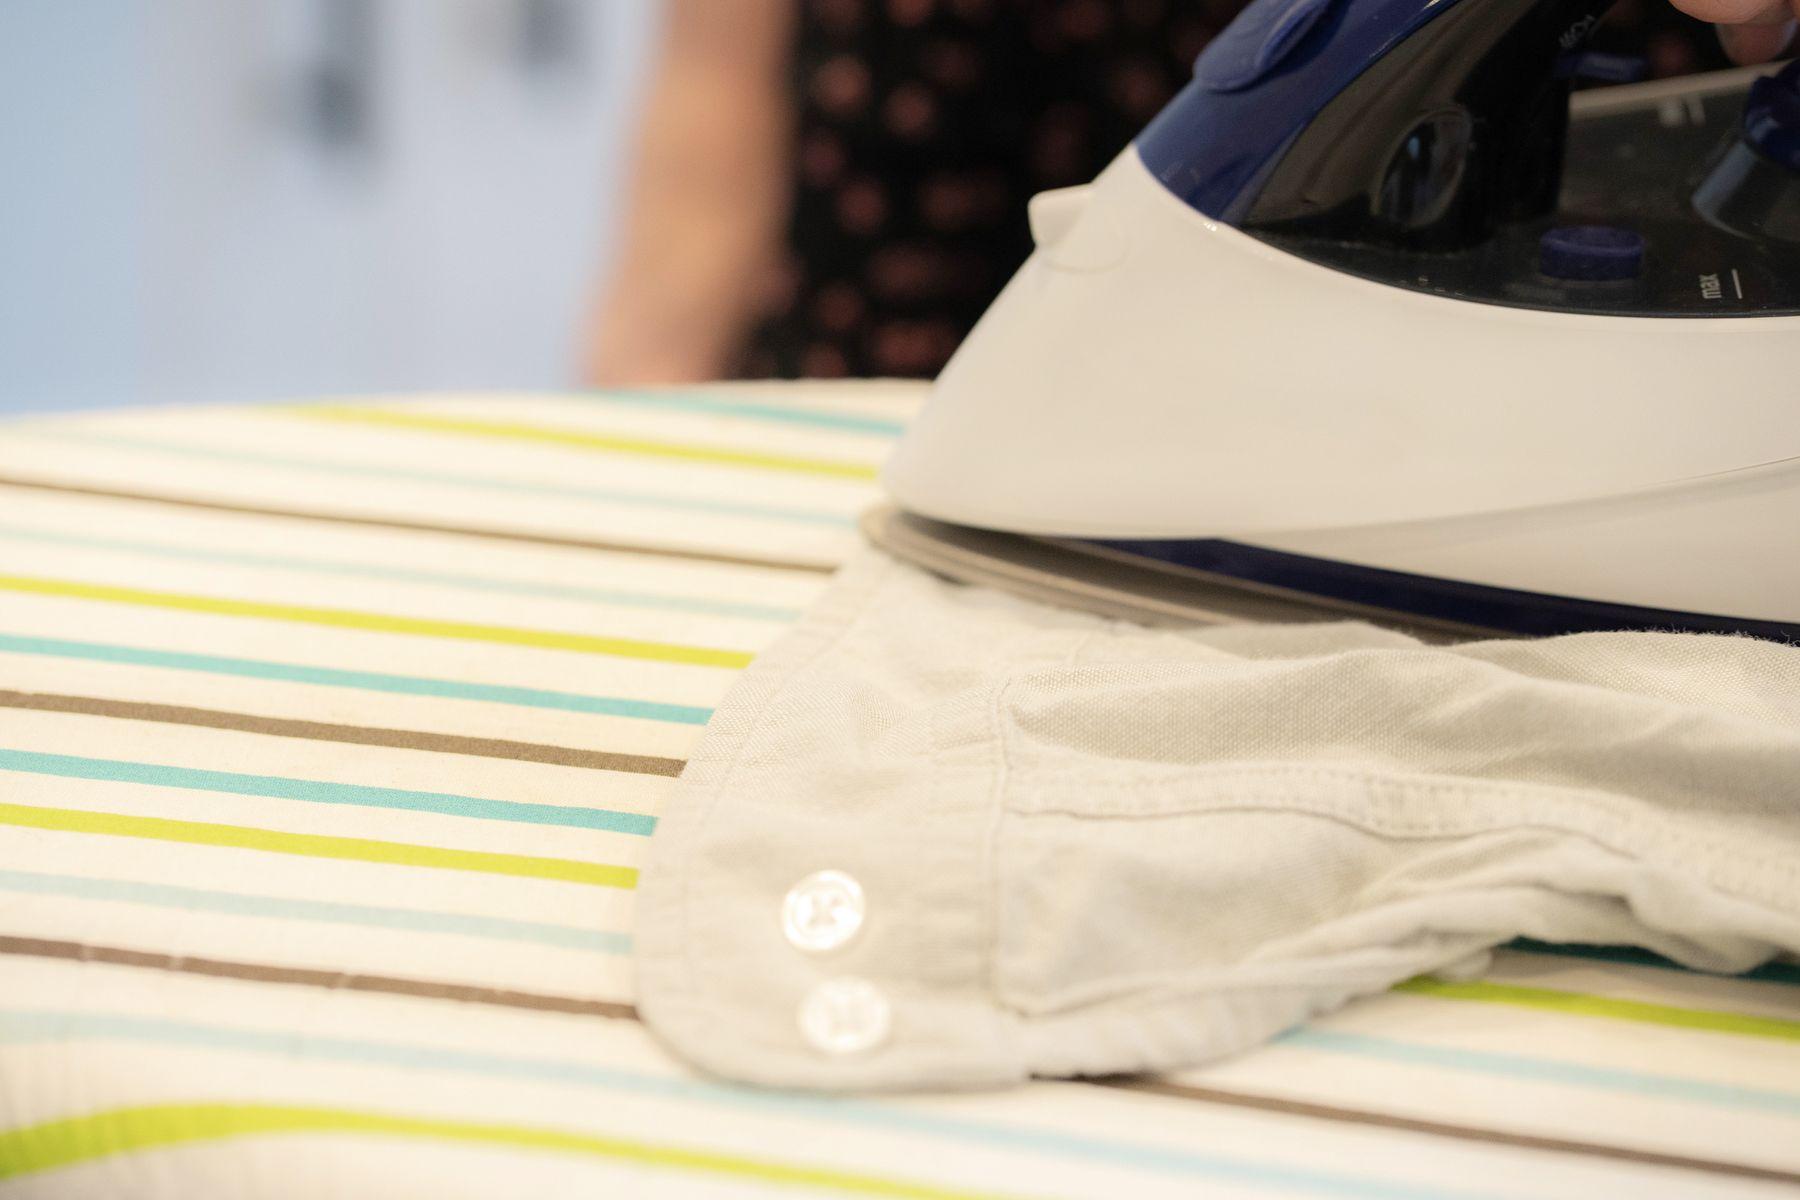 Ironing the cuffs of a shirt